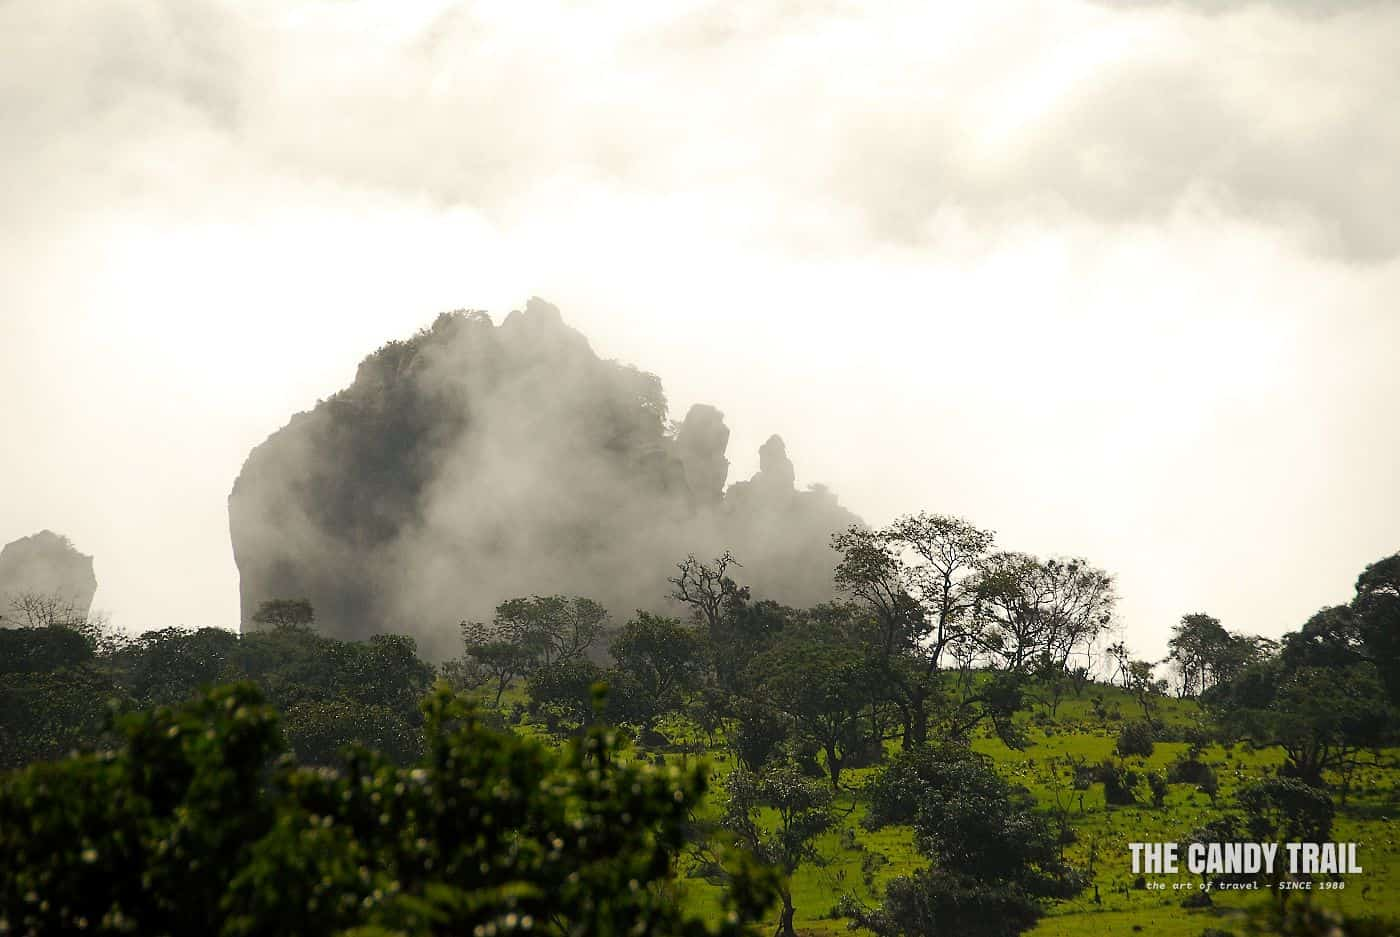 misty peak doucki canyon guinea